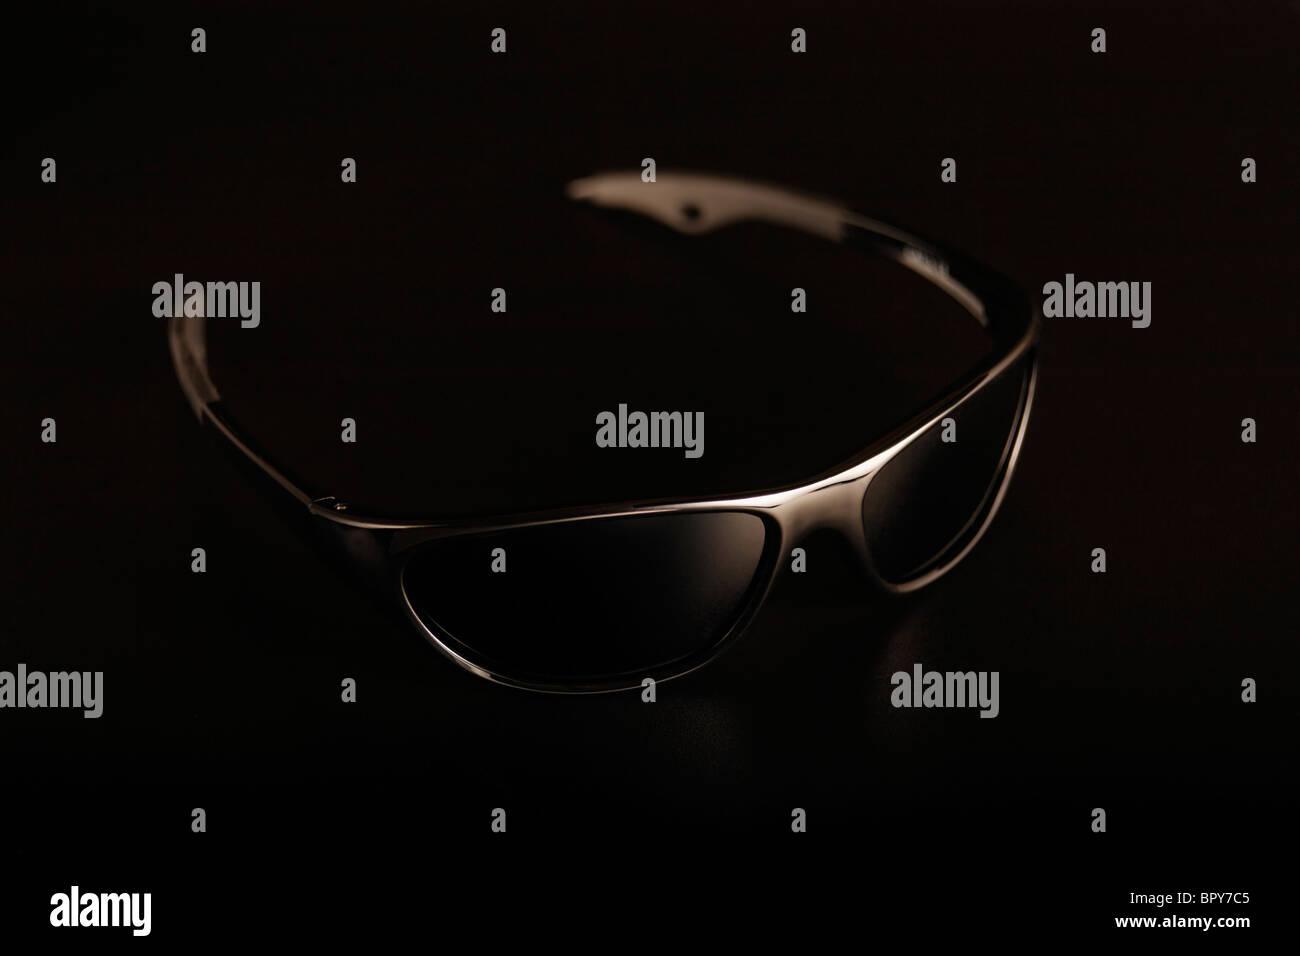 Sport sunglass on Black Background - Stock Image